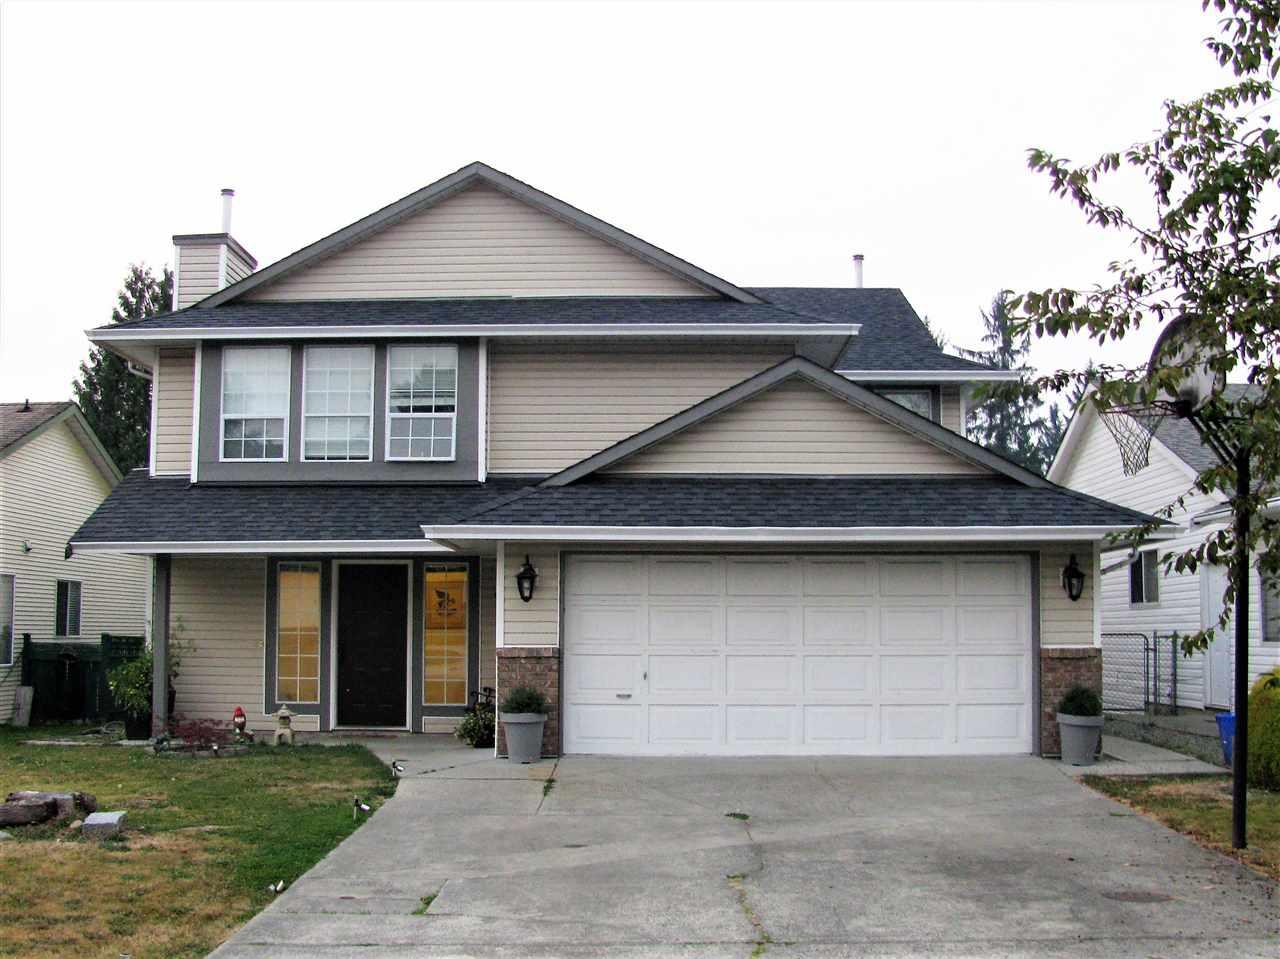 22975 125A AVENUE, Maple Ridge